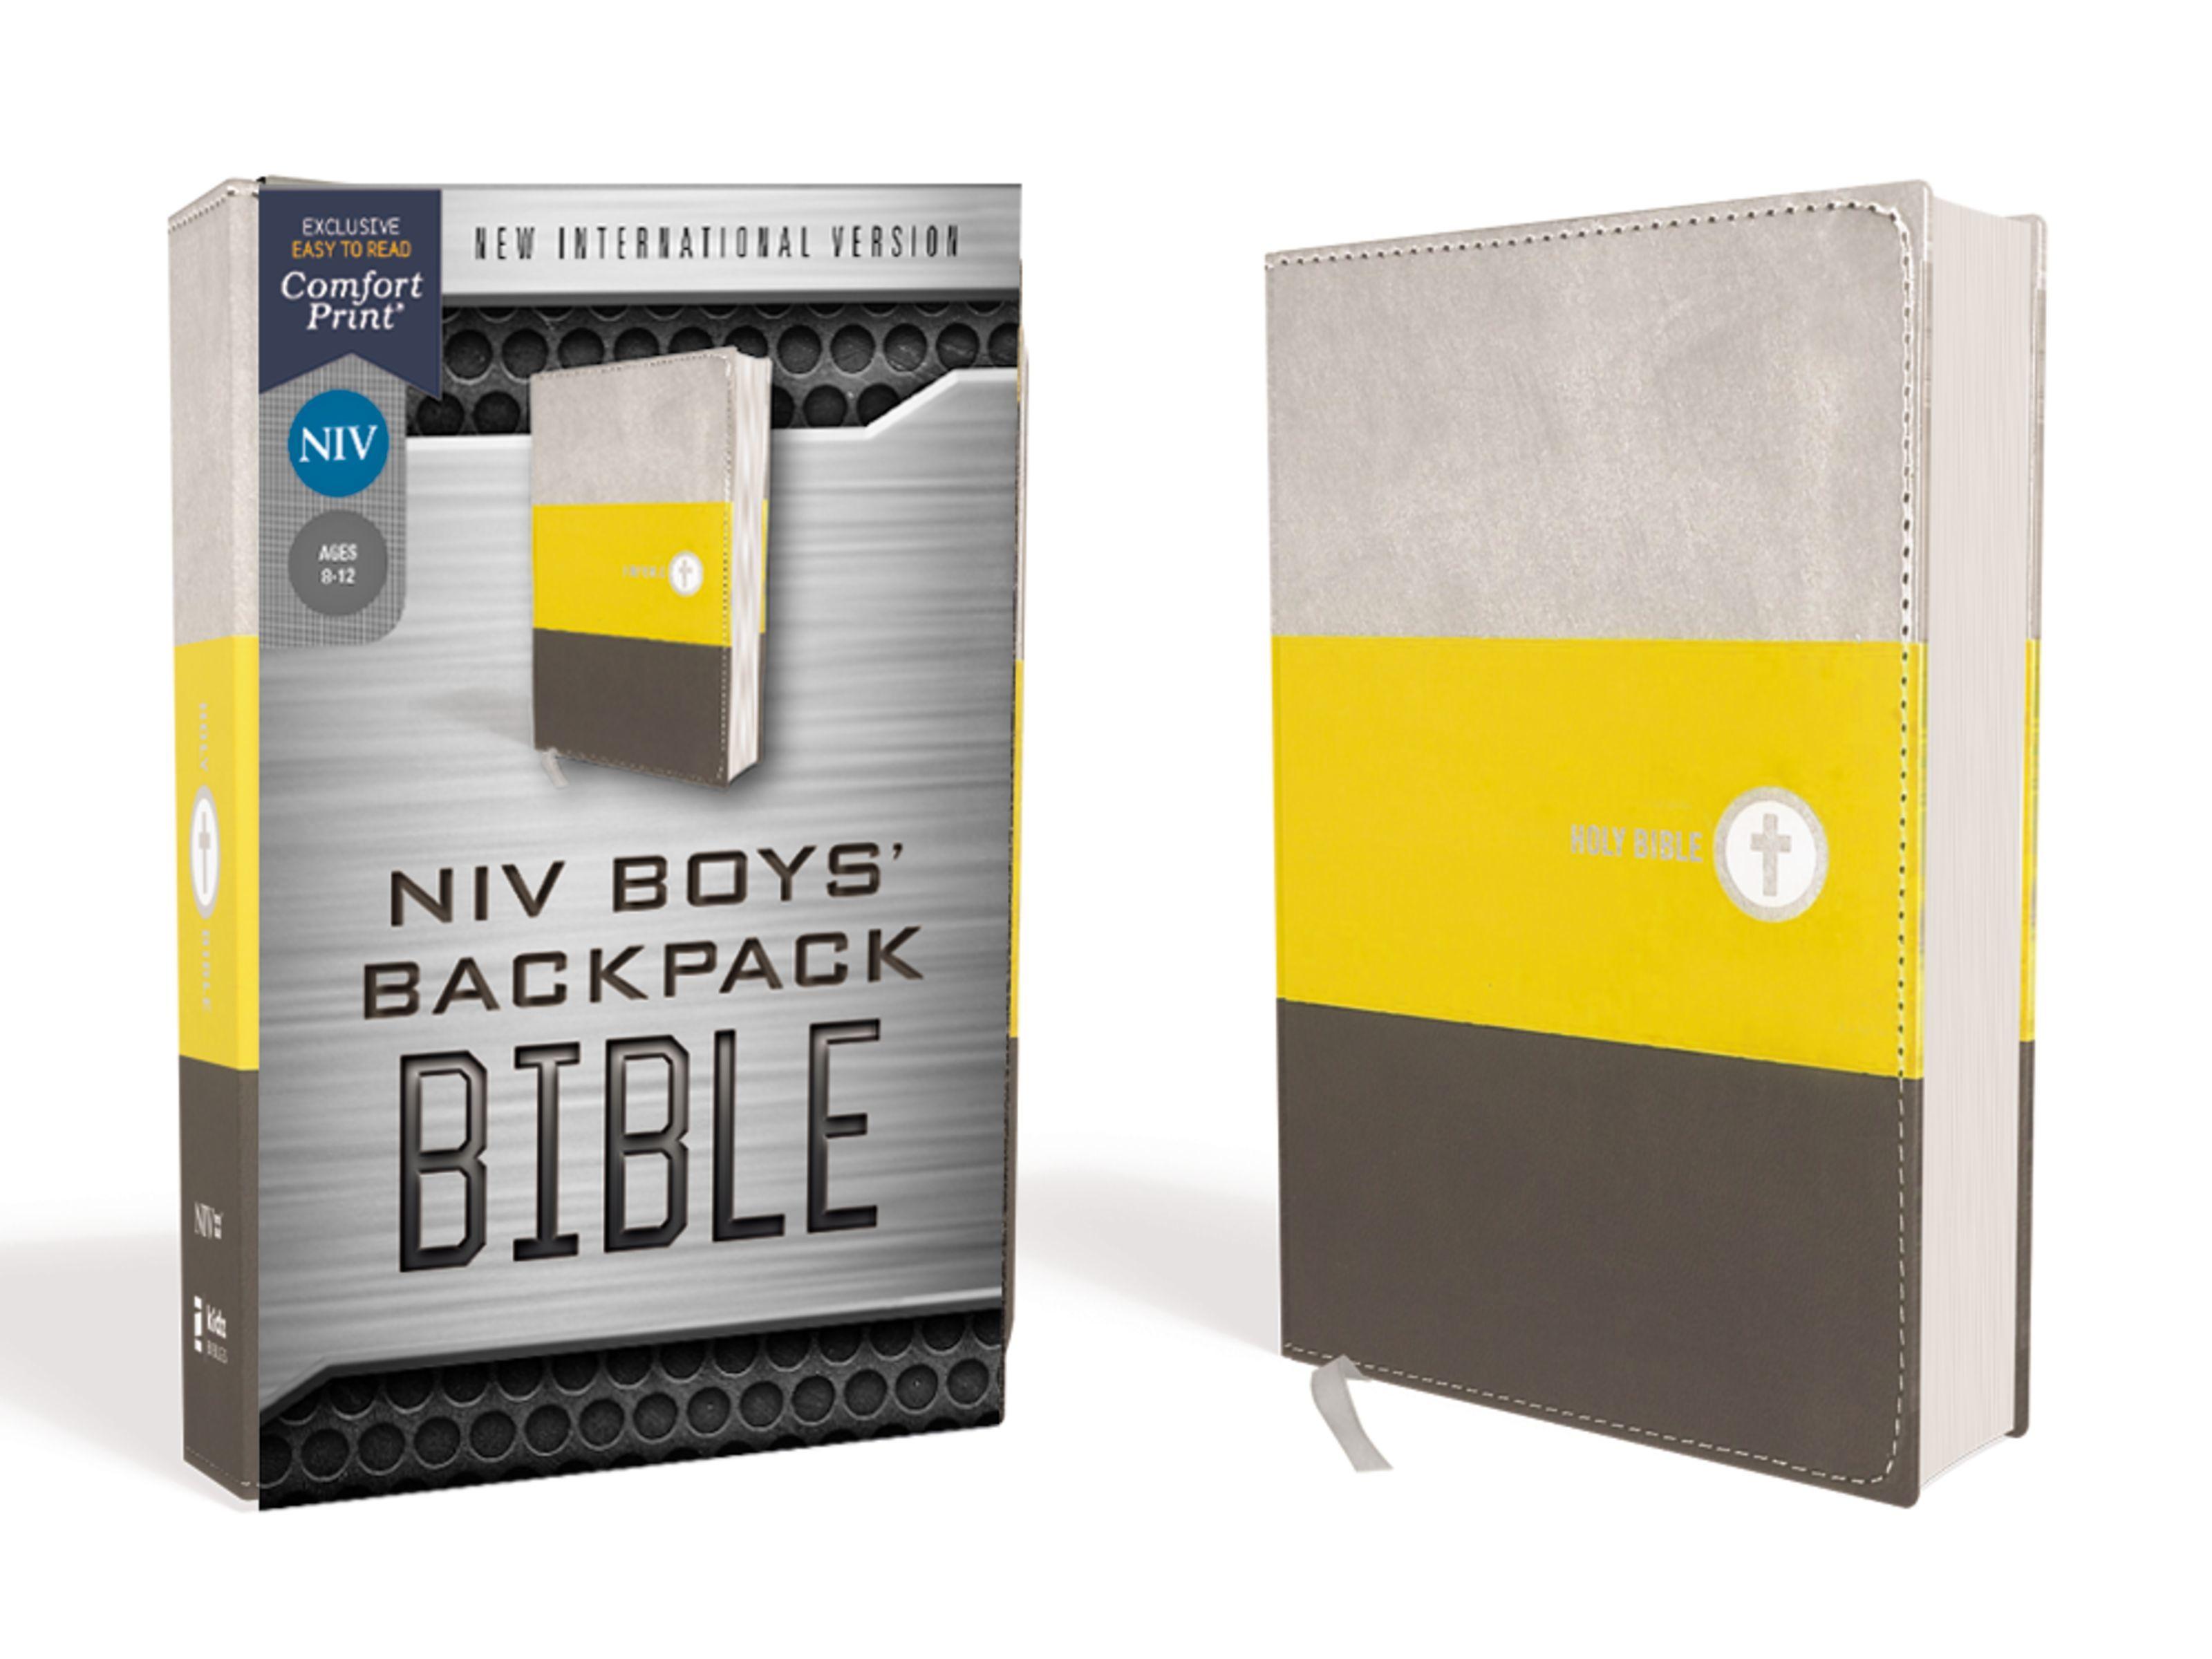 NIV Boys' Backpack Bible Compact- 97803104550004